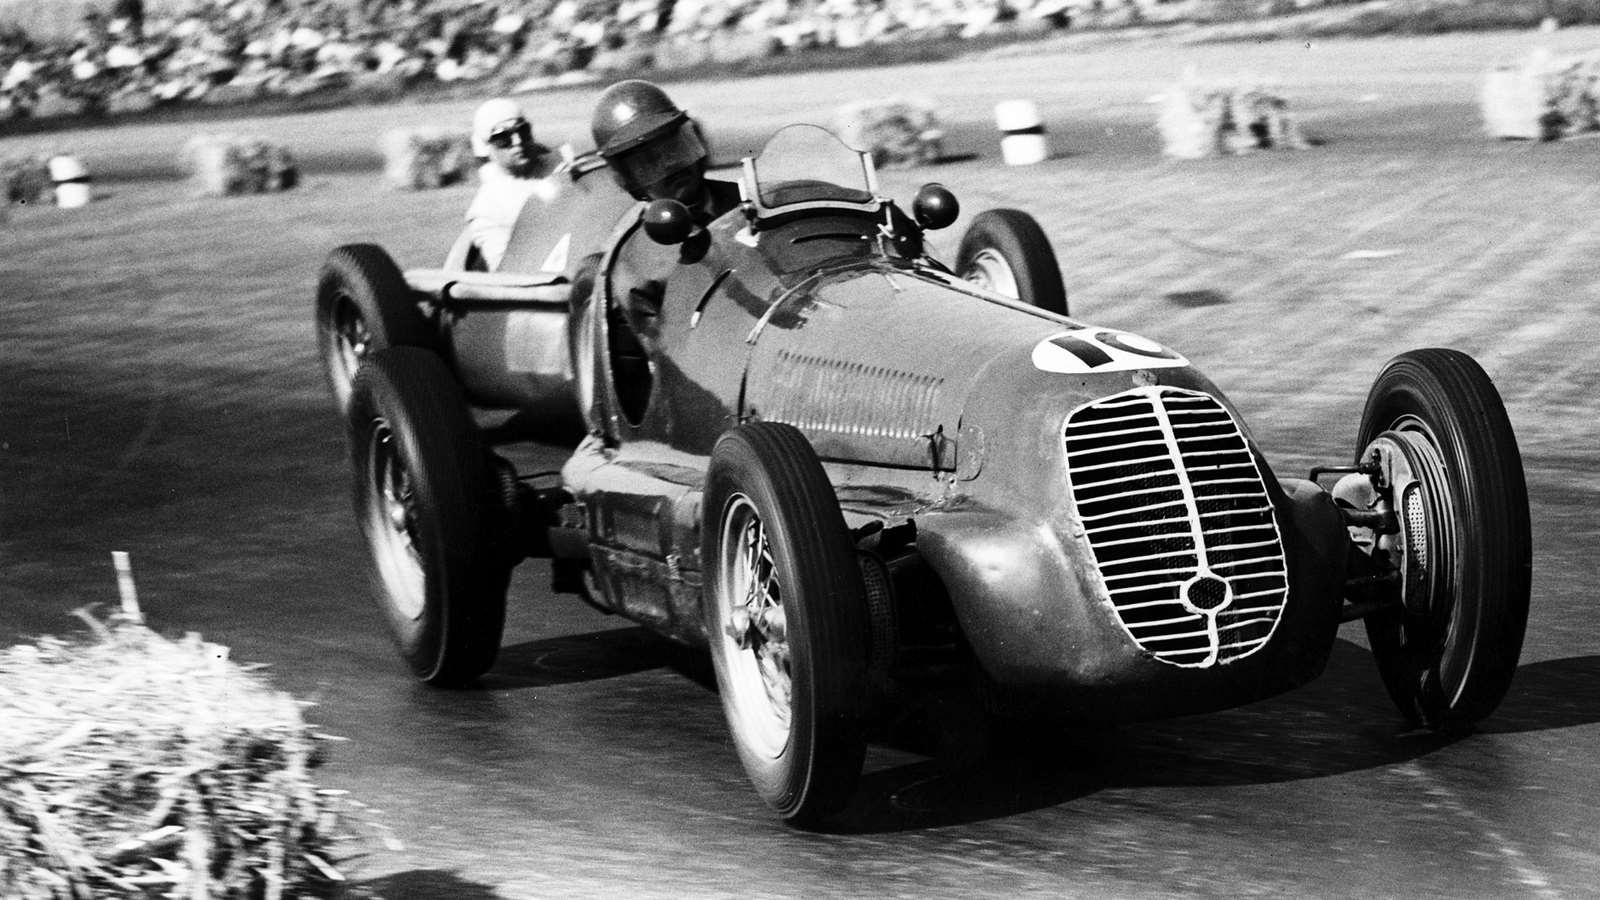 1950 British Grand Prix, the first Formula 1 race